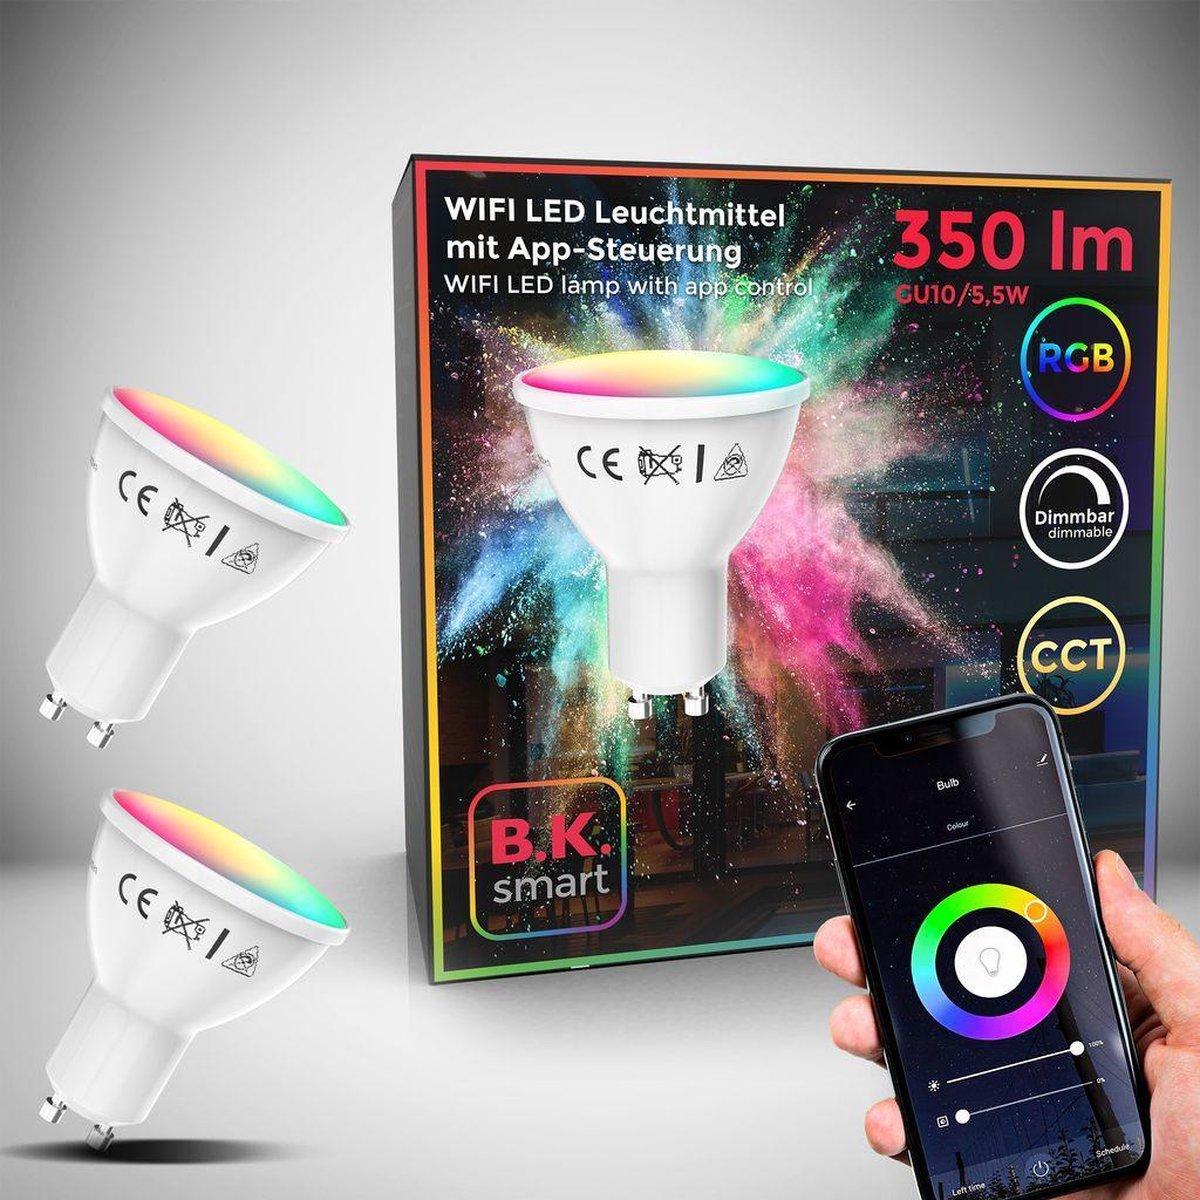 B.K.Licht - Slimme Lichtbron - RGB en CCT - set van 2 - smart lamp - met GU10 - 5.5W LED - WiFi - App - 2.700K to 6.500K - 350 Lm - voice control - color lampjes - LED lamp